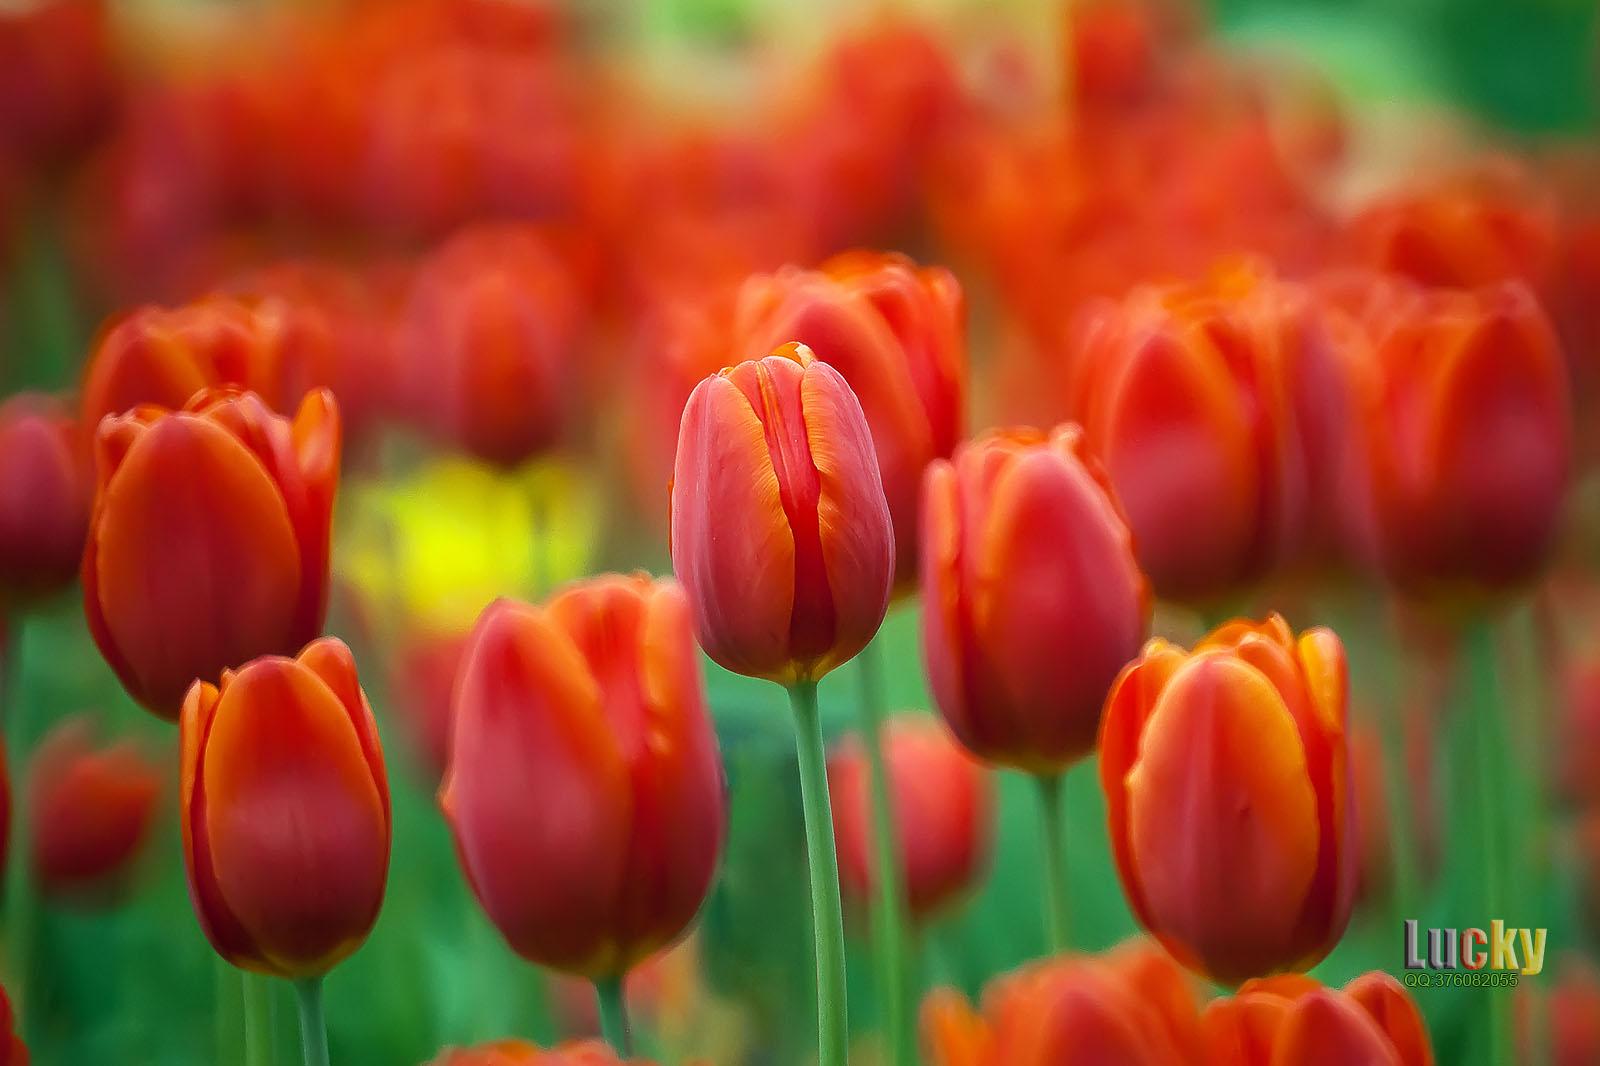 luckyangman作品:花儿为什么这么红